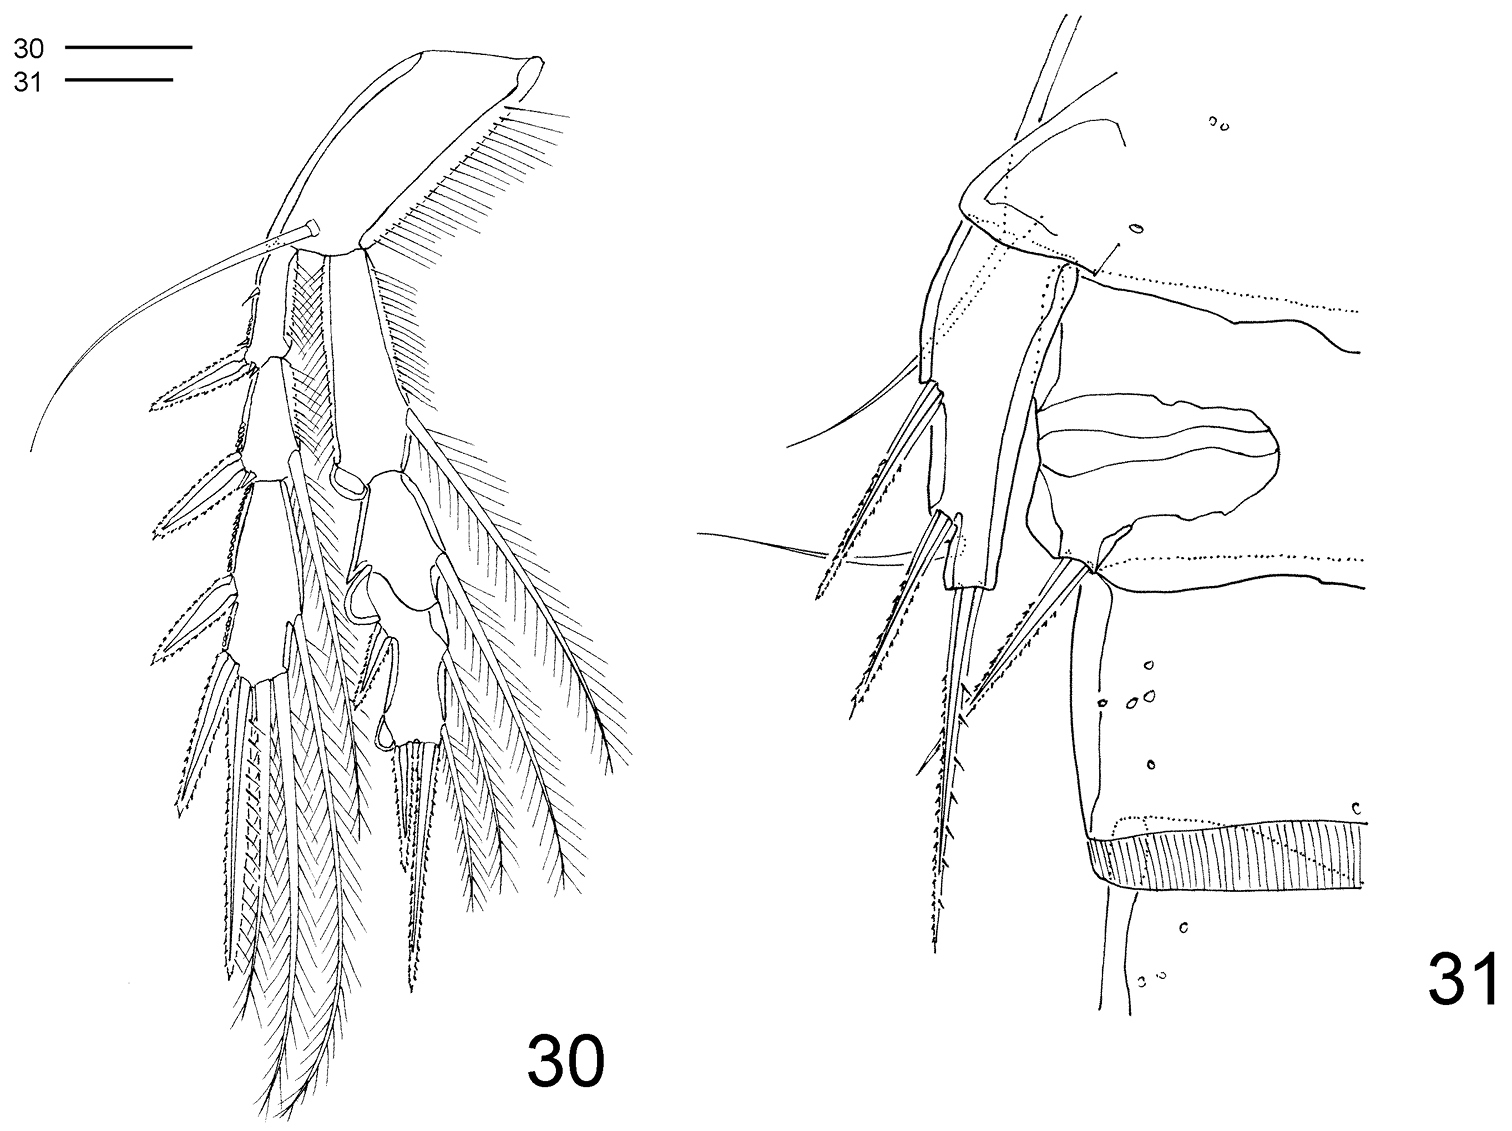 First Record Of Clausidium Copepoda Clausidiidae From Brazil A 1991 Pontiac 3 1l Engine Diagram New Species Associated With Ghost Shrimps Neocallichirus Grandimana Gibbes